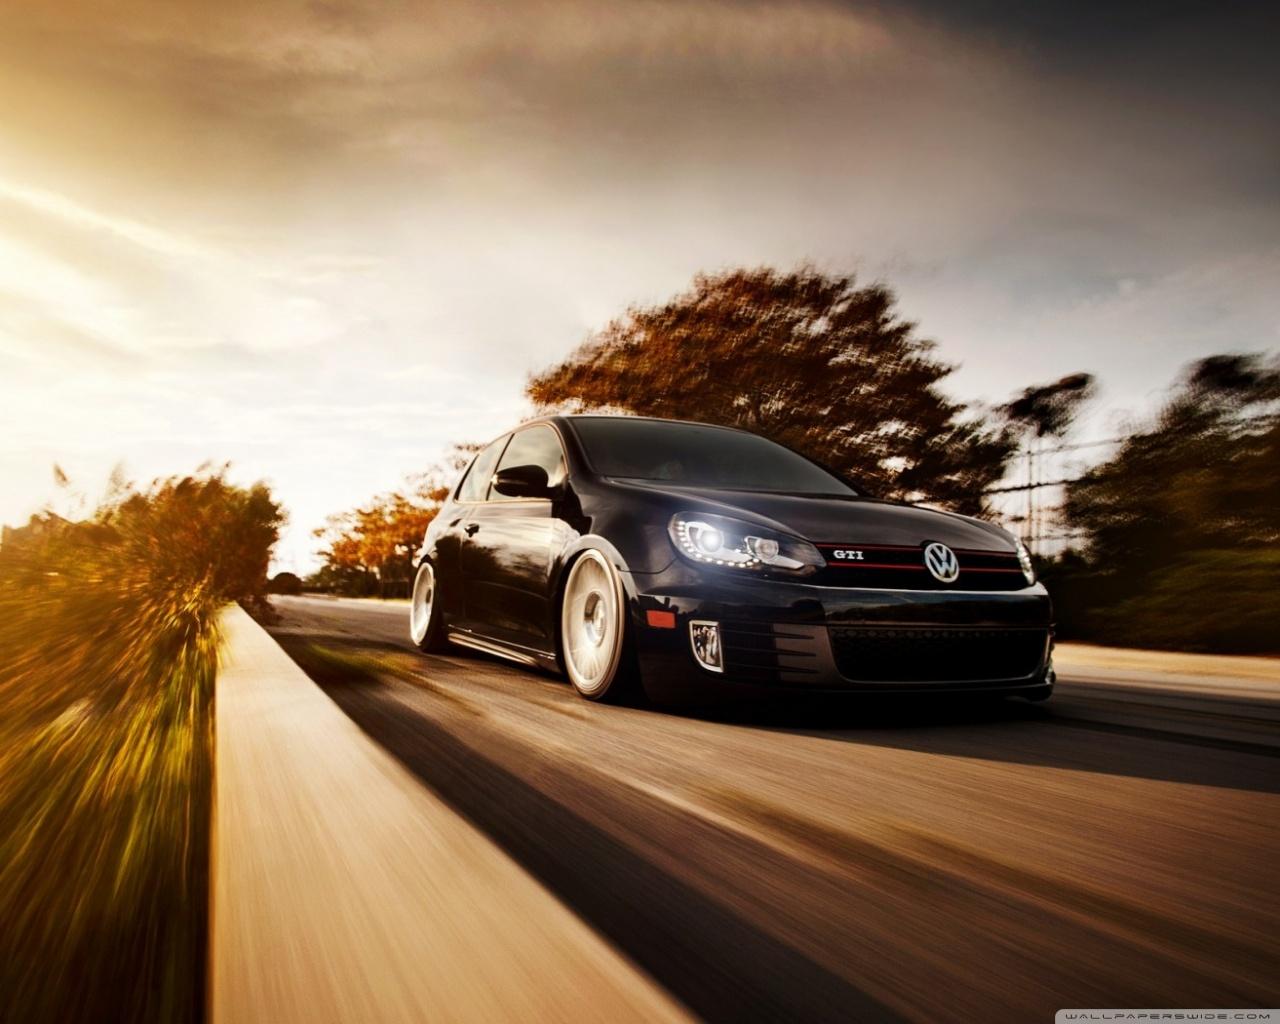 Volkswagen HD desktop wallpaper : High Definition : Fullscreen